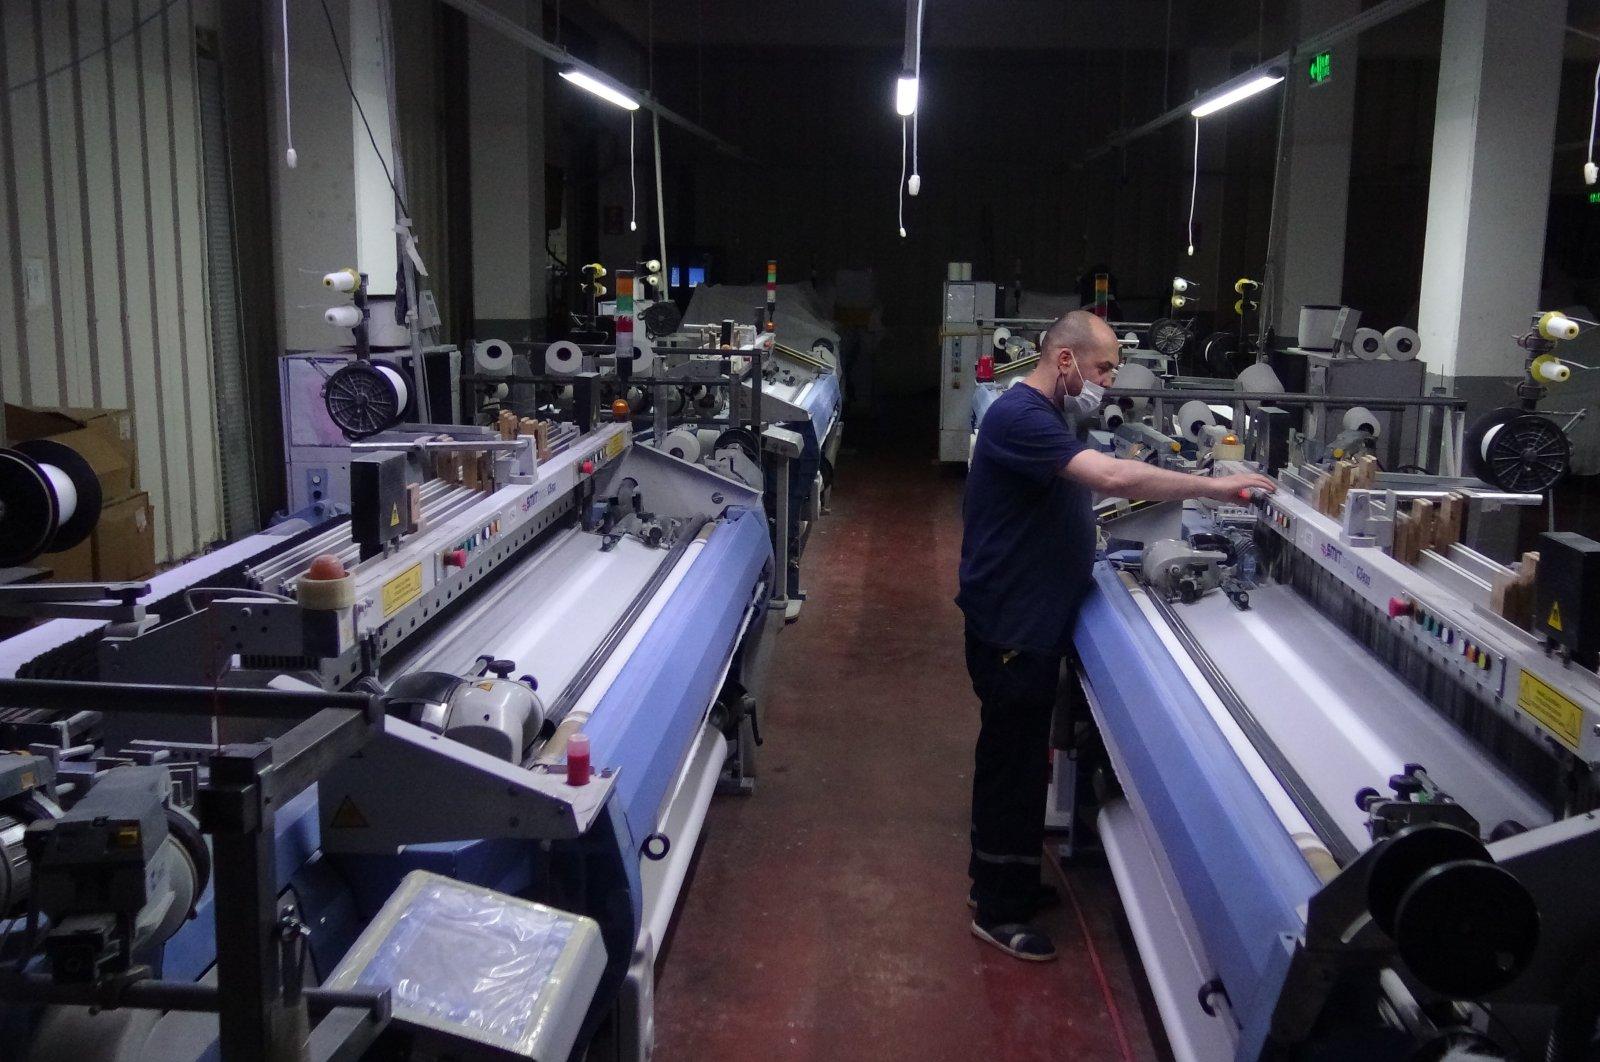 A textile factory in northwestern Turkey's Bursa province in an undated photo. (IHA Photo)